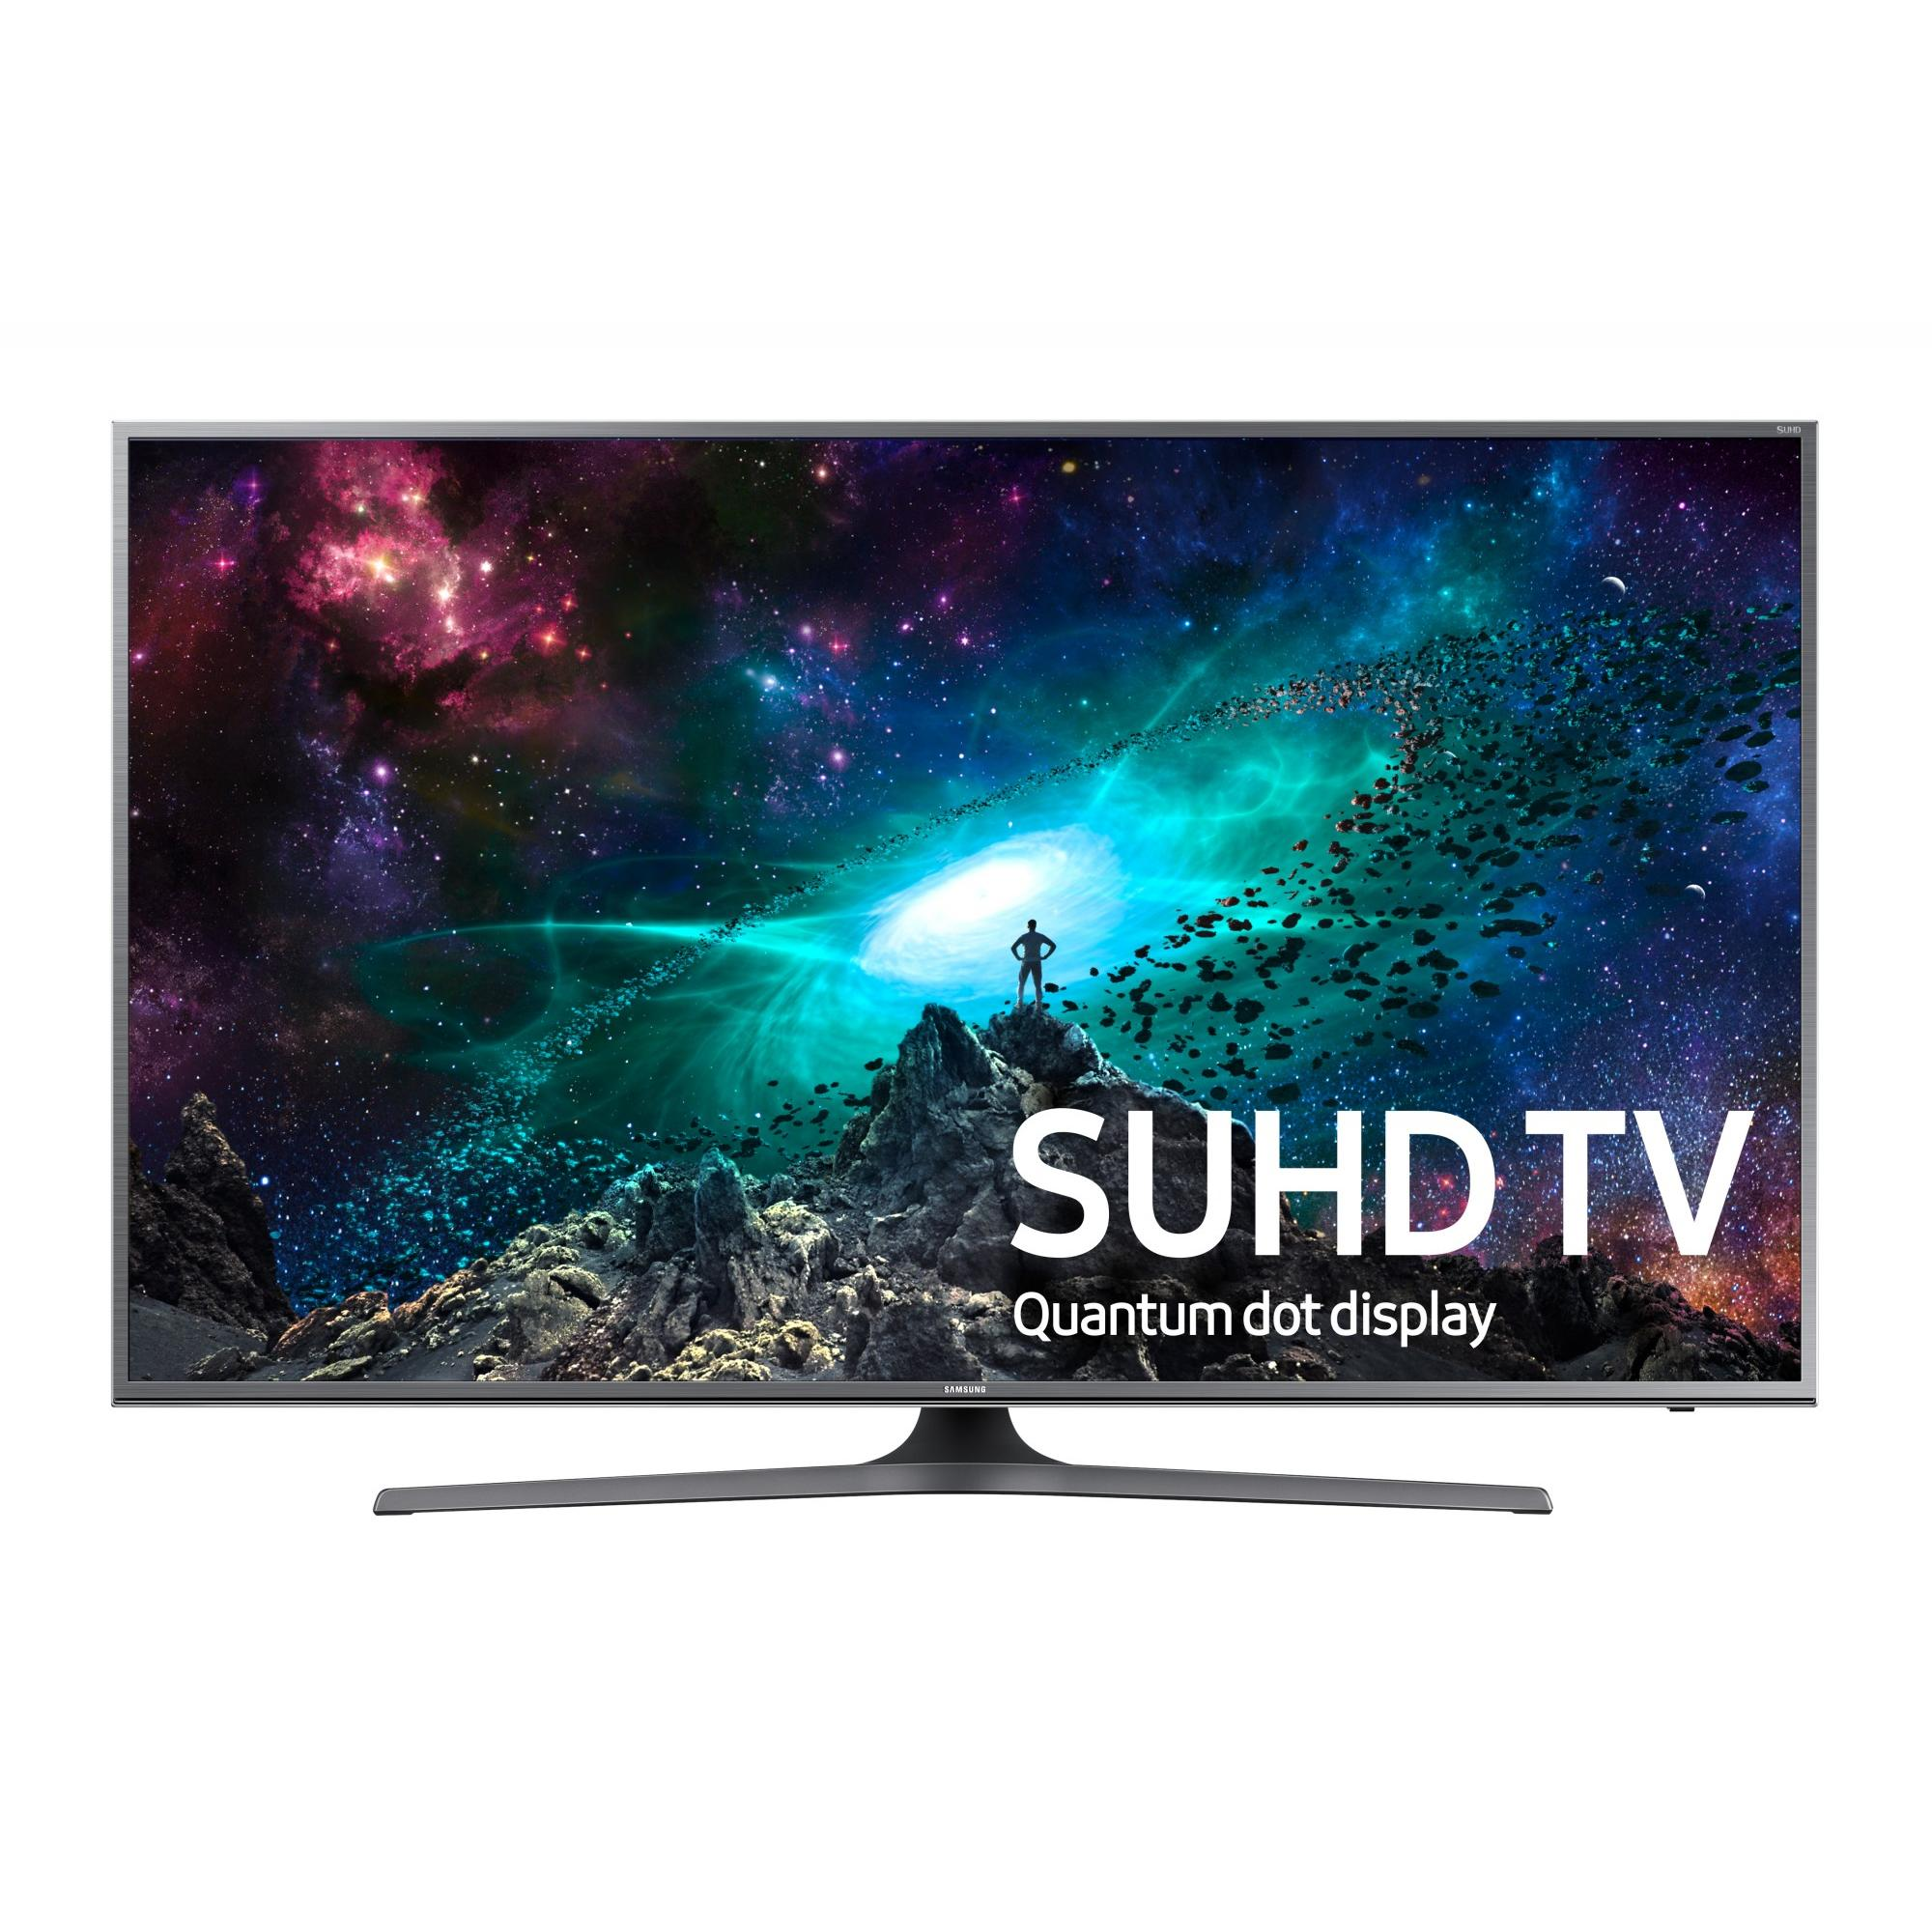 "SAMSUNG 50"" 7000 Series - 4K SUHD Smart LED TV - 2160p, 120MR (Model#: UN50JS7000)"